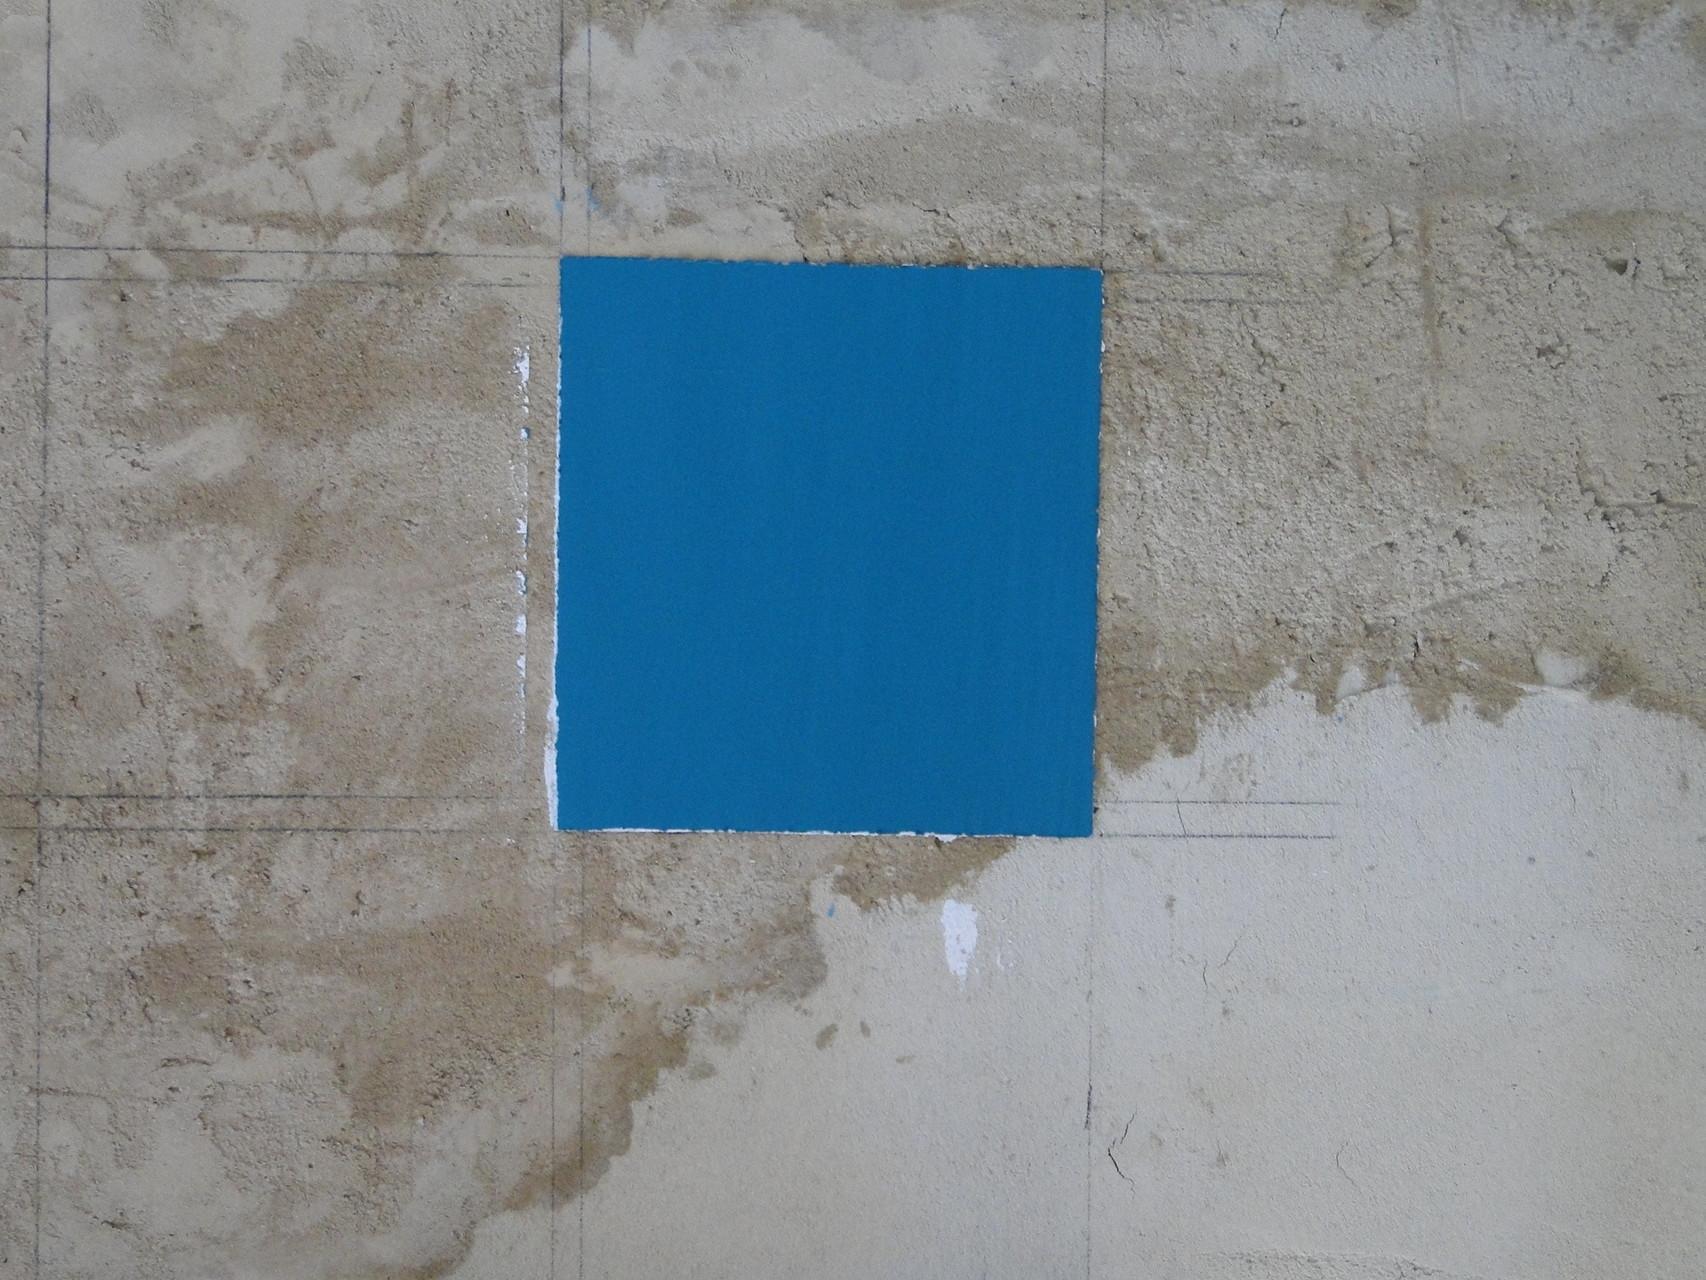 Das erste fertige Quadrat in meiner Lieblingsfarbe